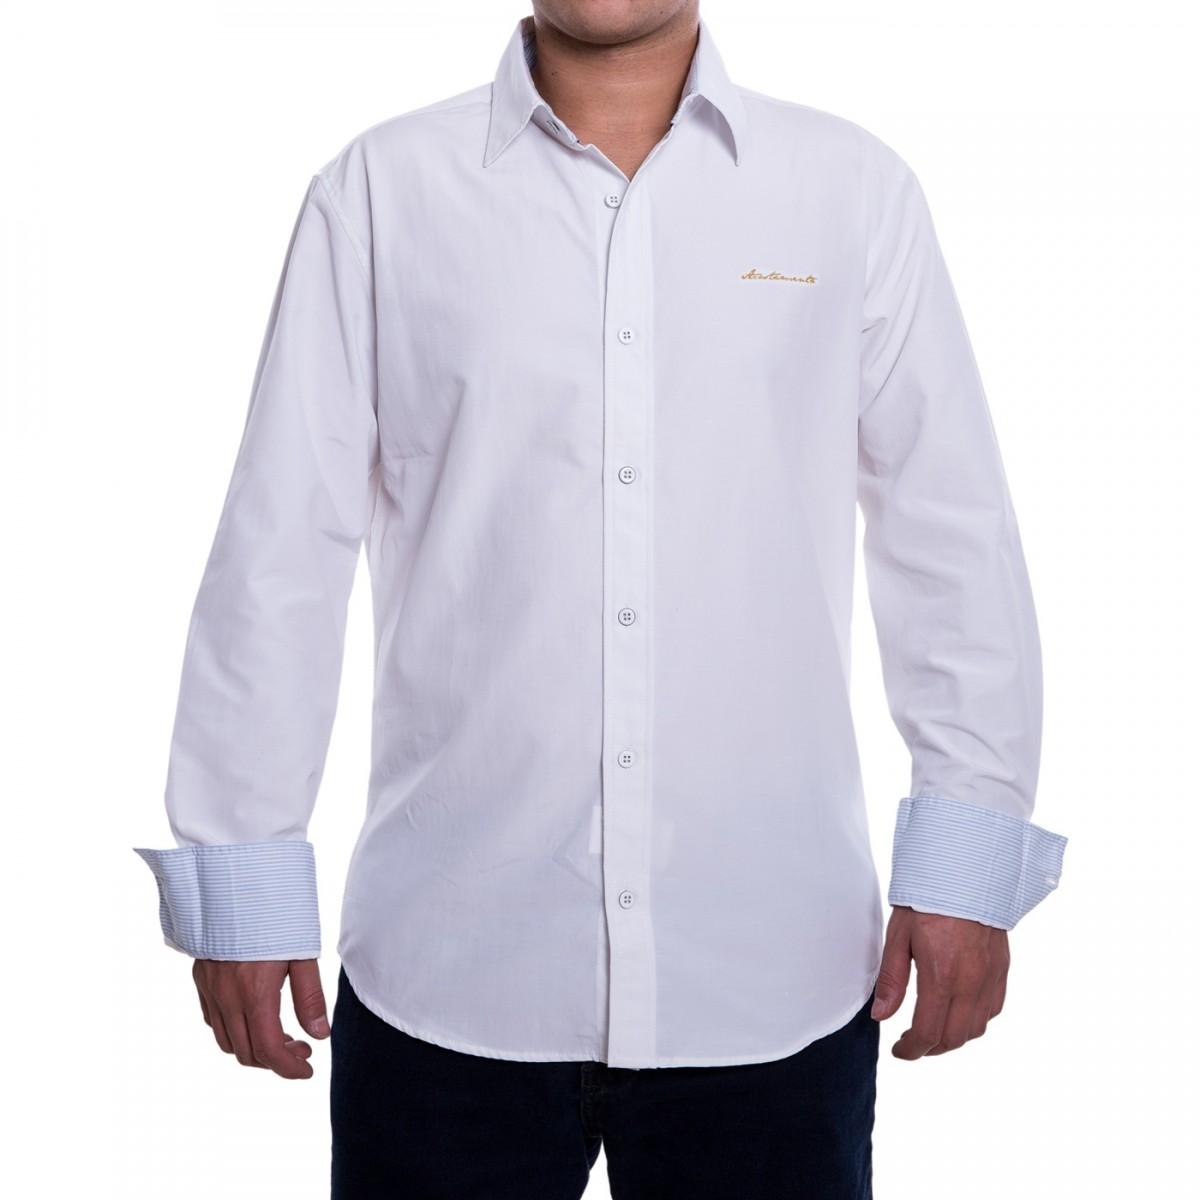 91536004e8f82 Bizz Store - Camisa Social Masculina Acostamento Manga Longa Branca